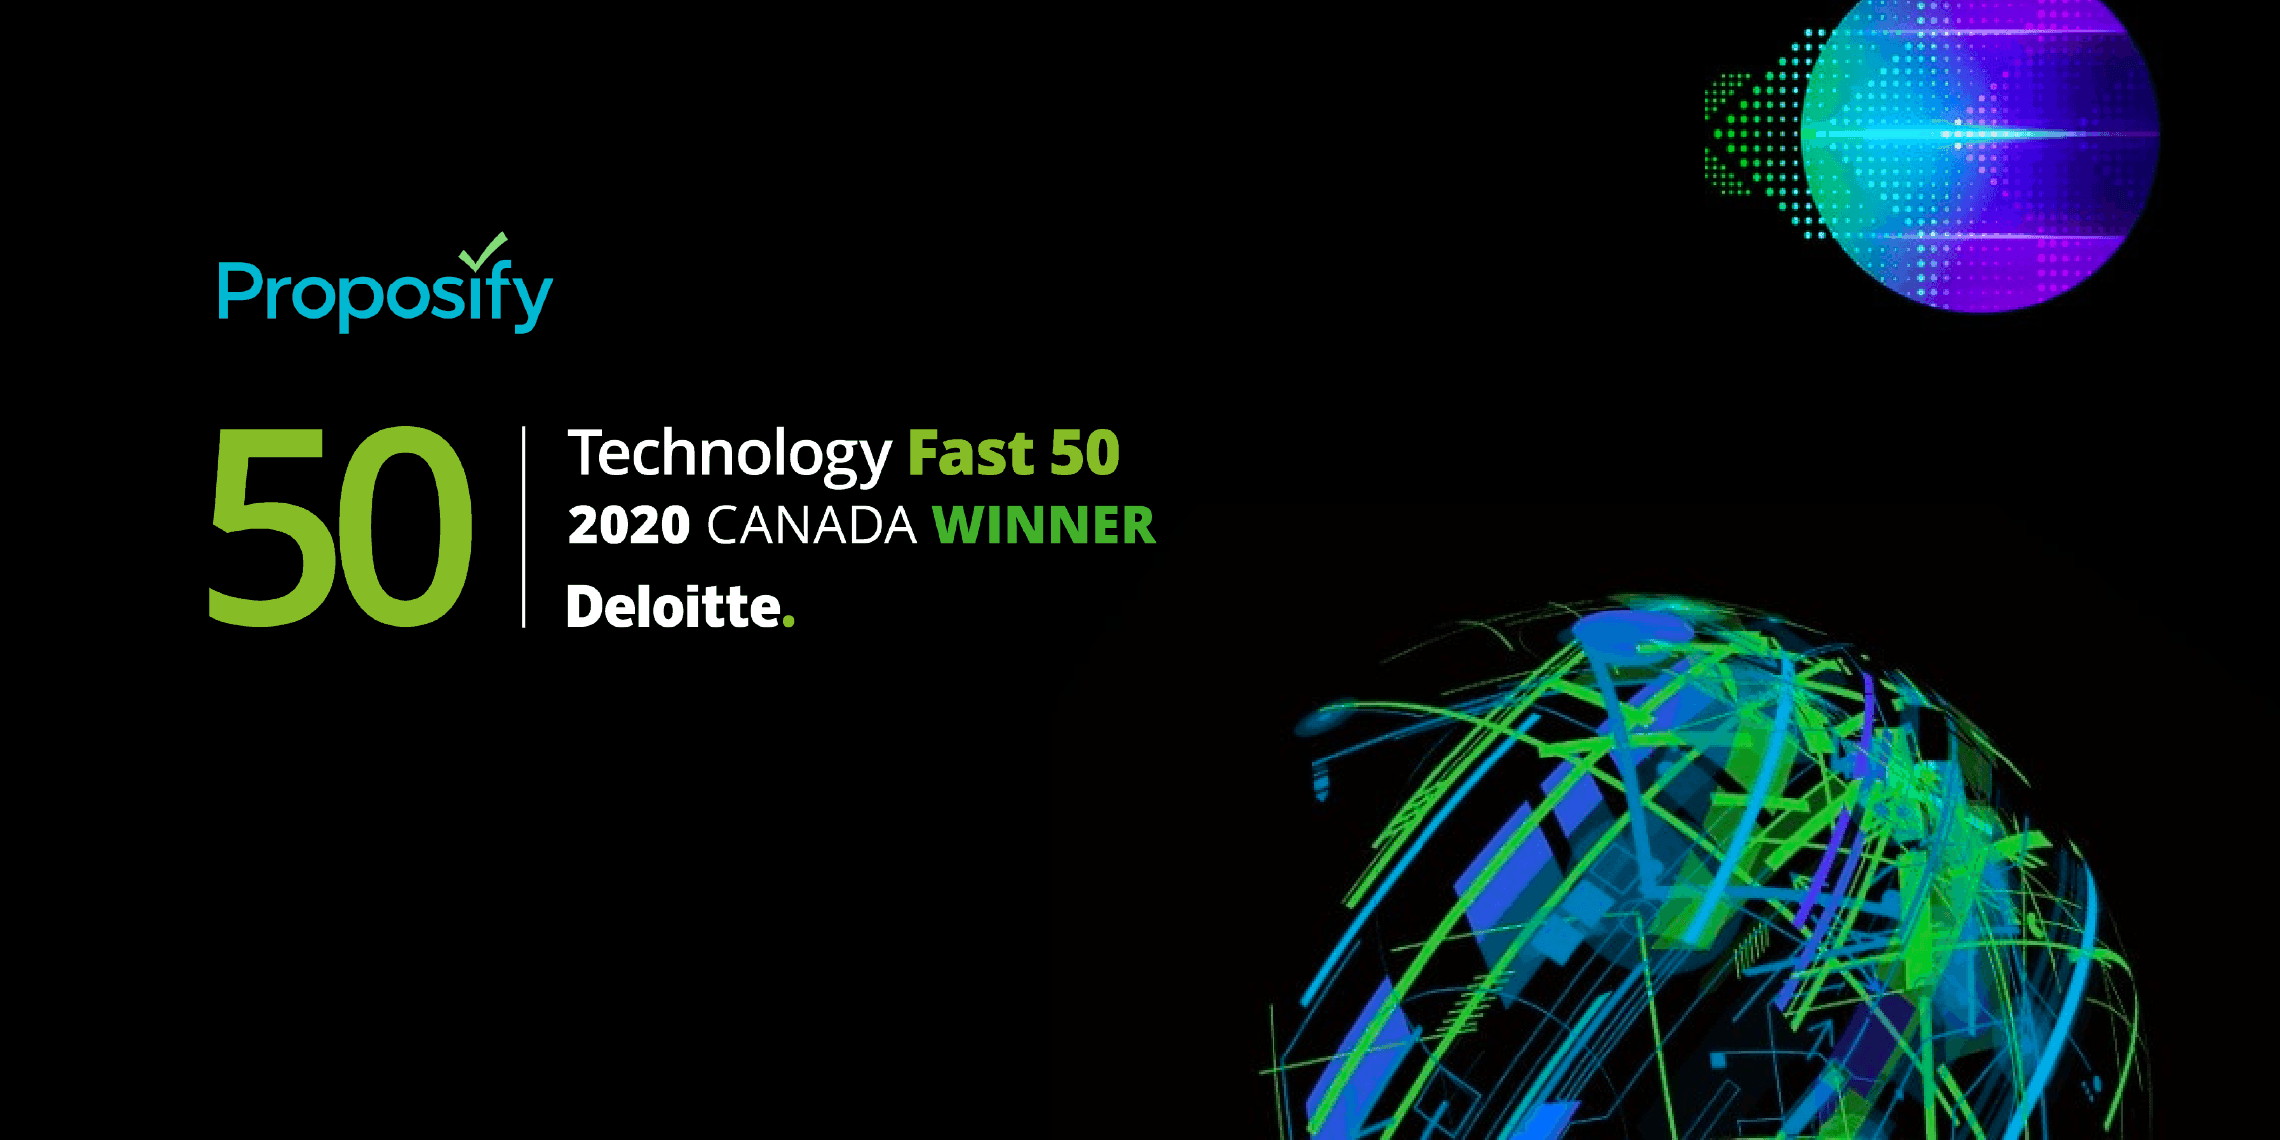 deloitte technology fast 50 2020 proposify announcement